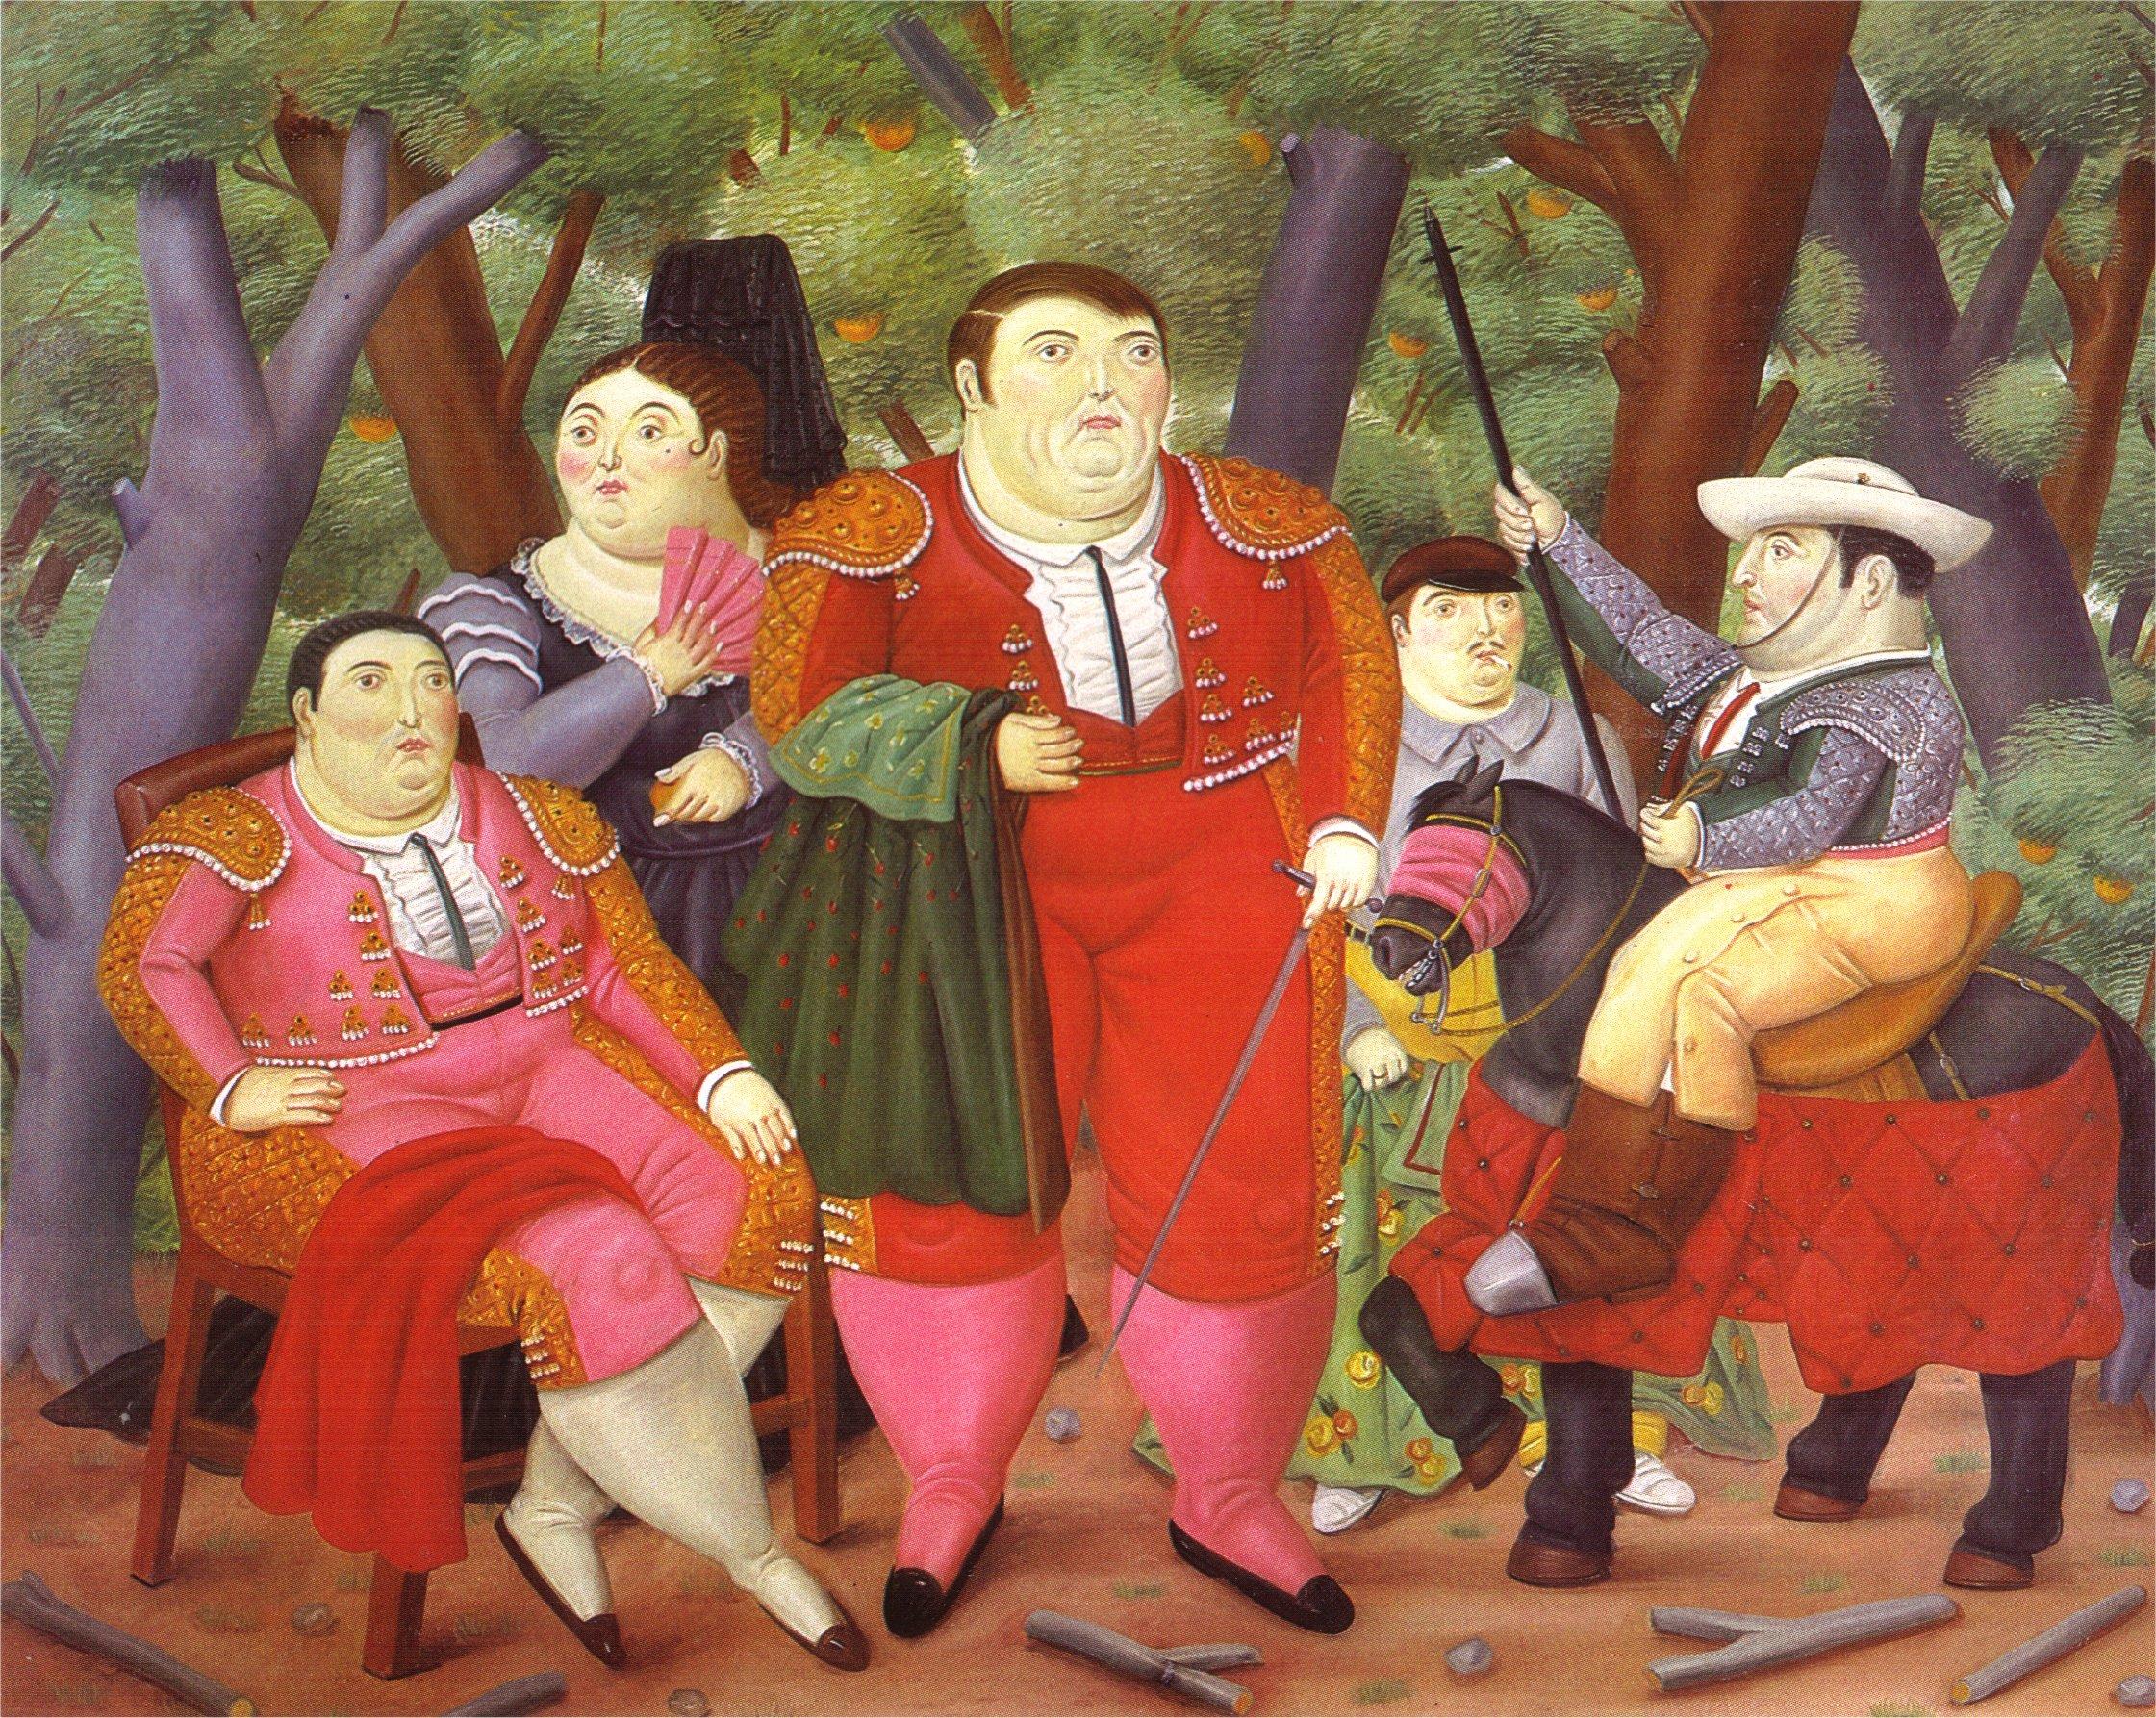 Célèbre Lefty and His Gang, 1987 - Fernando Botero - WikiArt.org YZ23